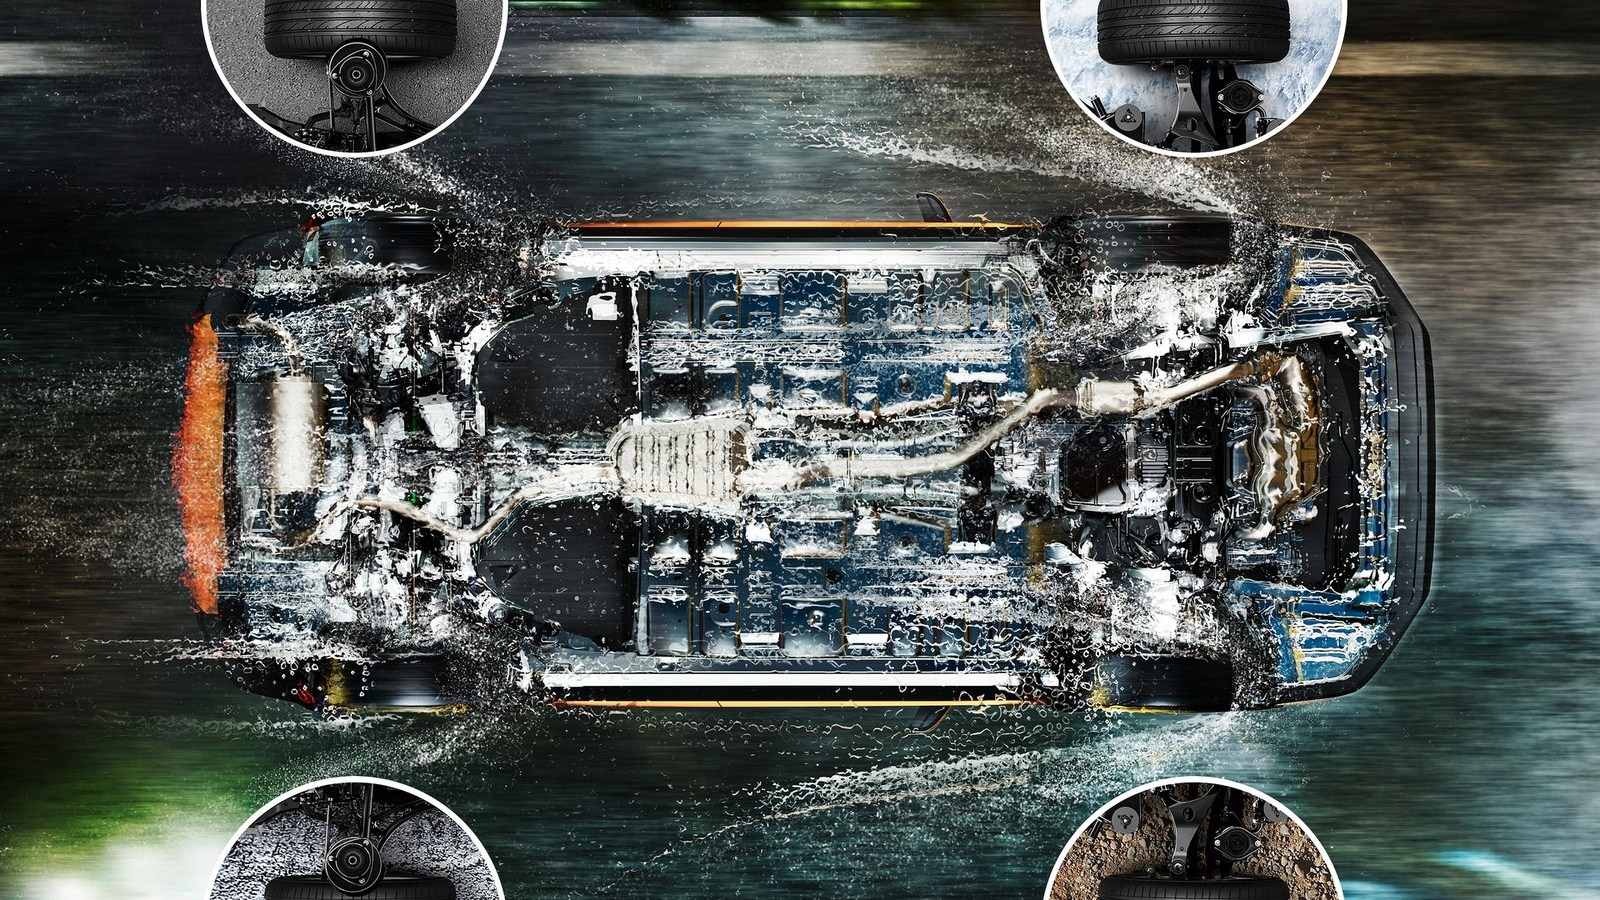 http://1.bp.blogspot.com/-OkICSLldltI/UA1sG5dwT8I/AAAAAAAAEKM/TSwfXr6Ooas/s1600/Subaru-XV_2012_1600x1200_wallpaper_15+%28Copy%29.jpg